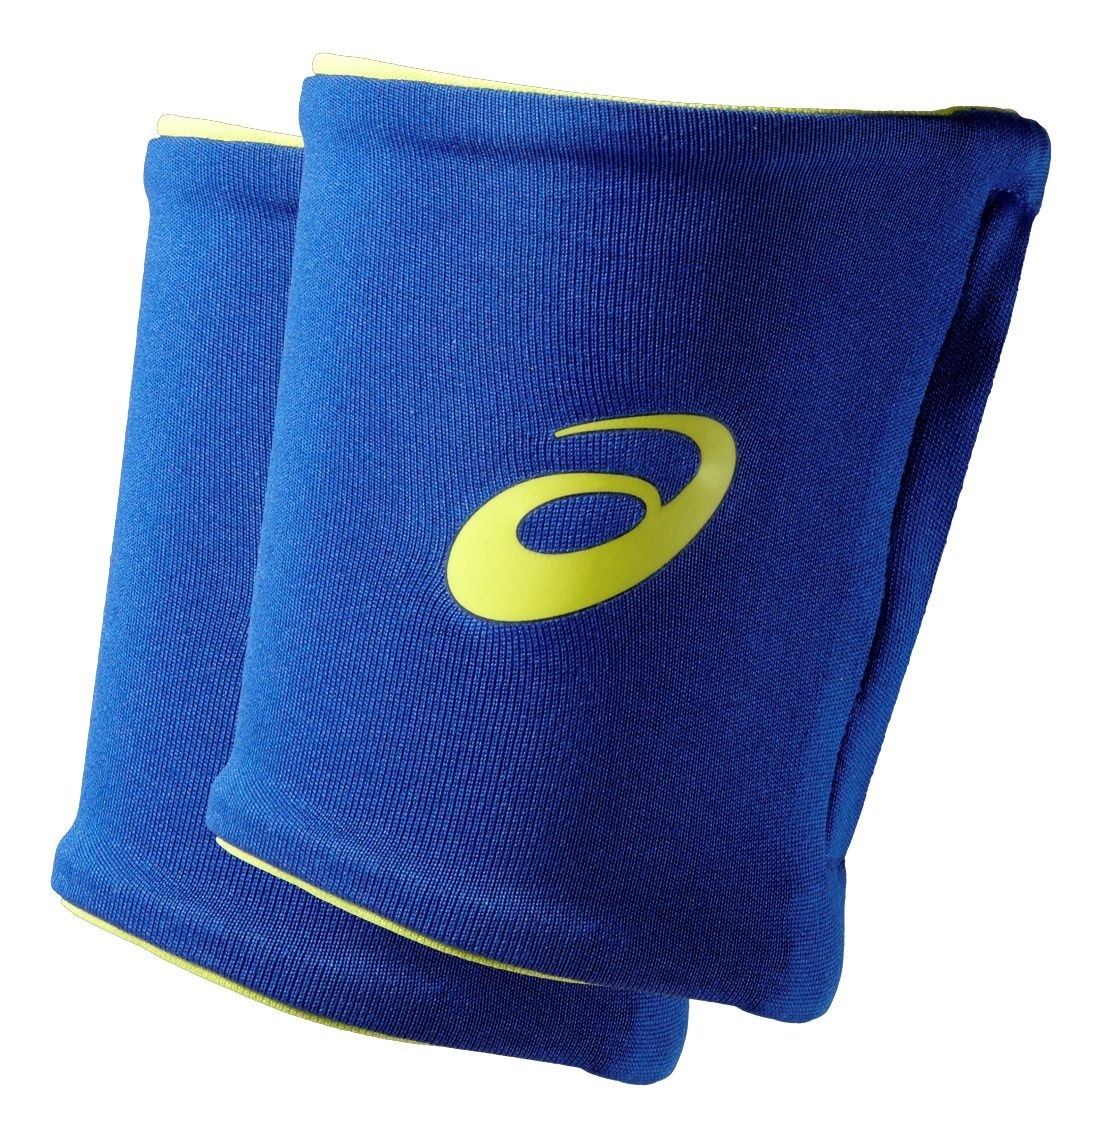 Напульсники для занятий спортом Asics Core Wristband (132085 8107) синие фото